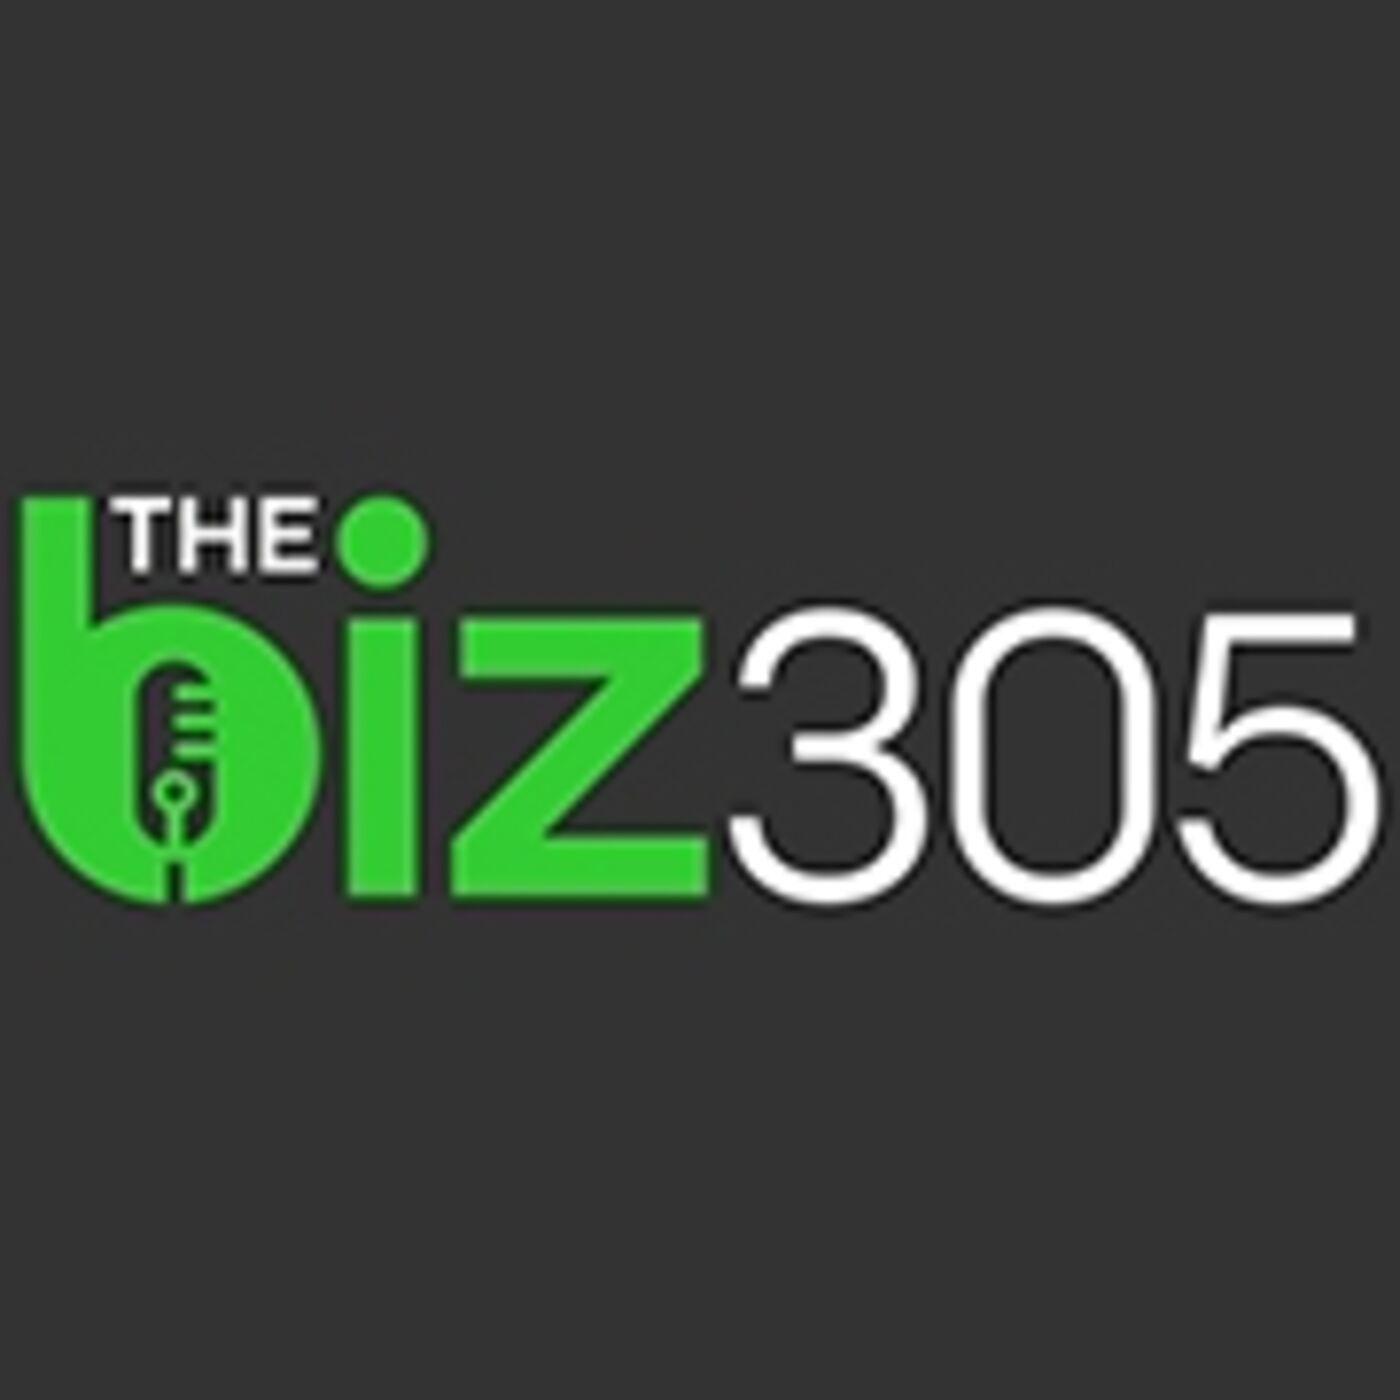 BIZ 305 features Qvivo Brands - Tony Haber   Whilly Bermudez